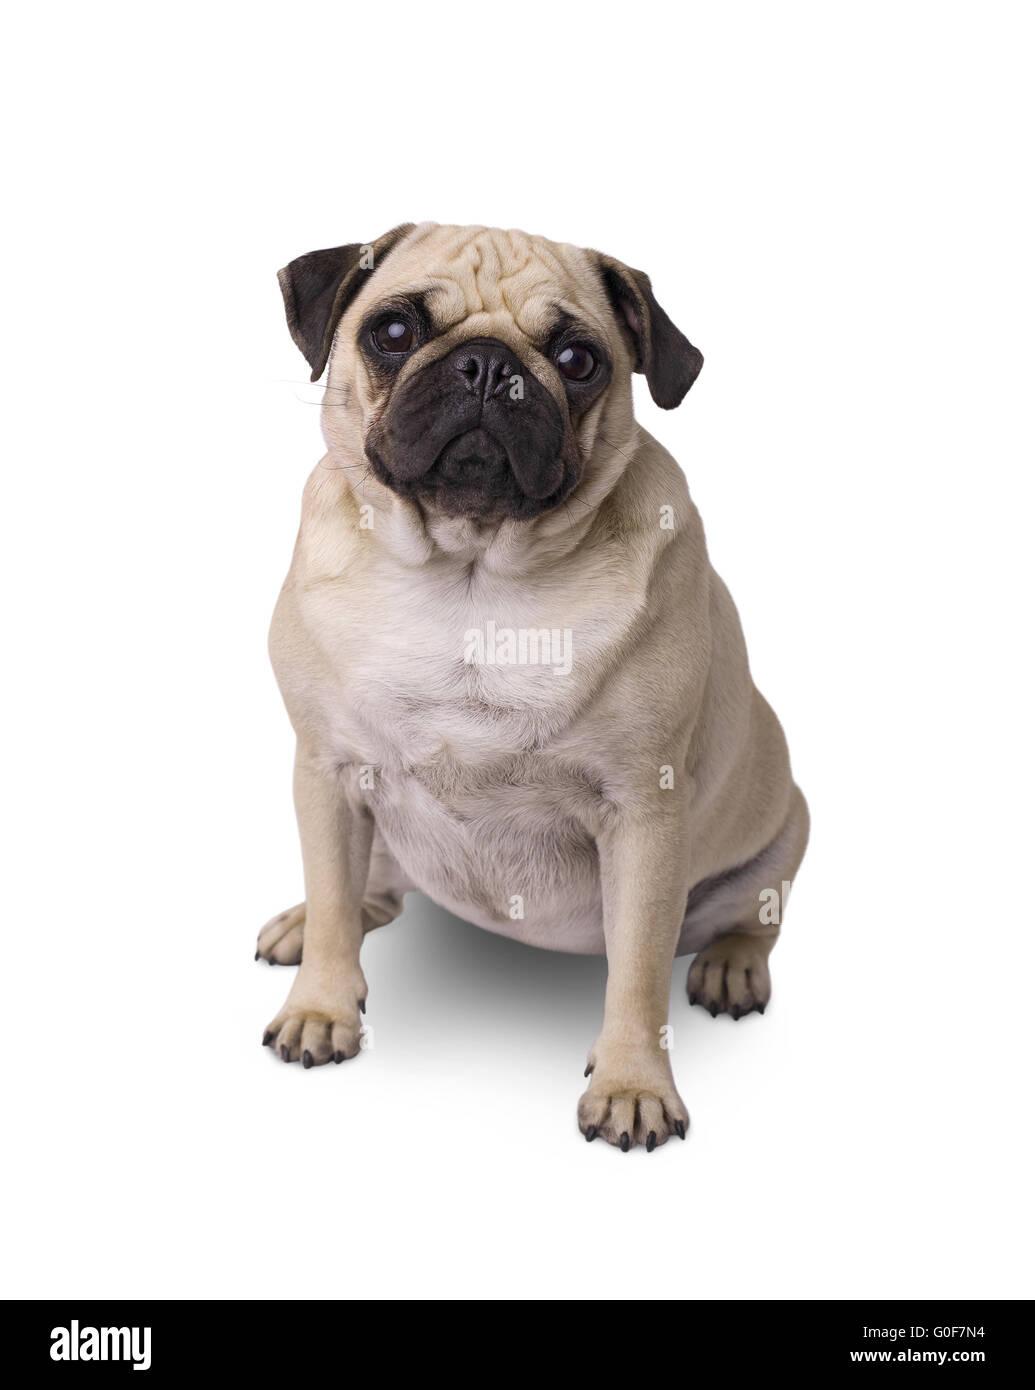 pug dog - Stock Image